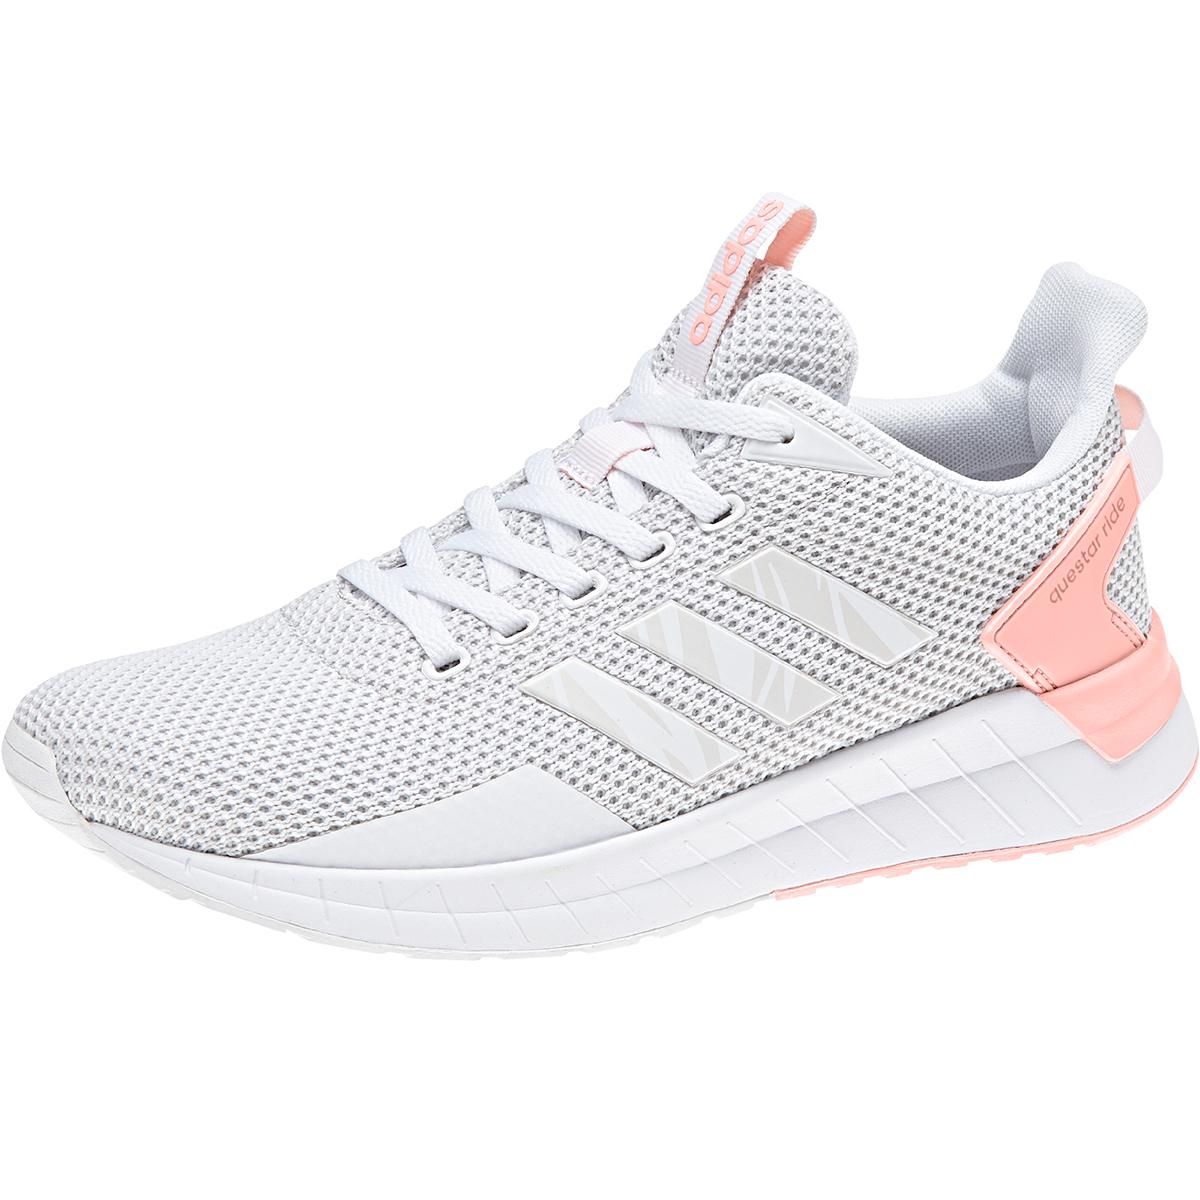 Adidas Women's Questar Ride Running Shoes - White, 9.5